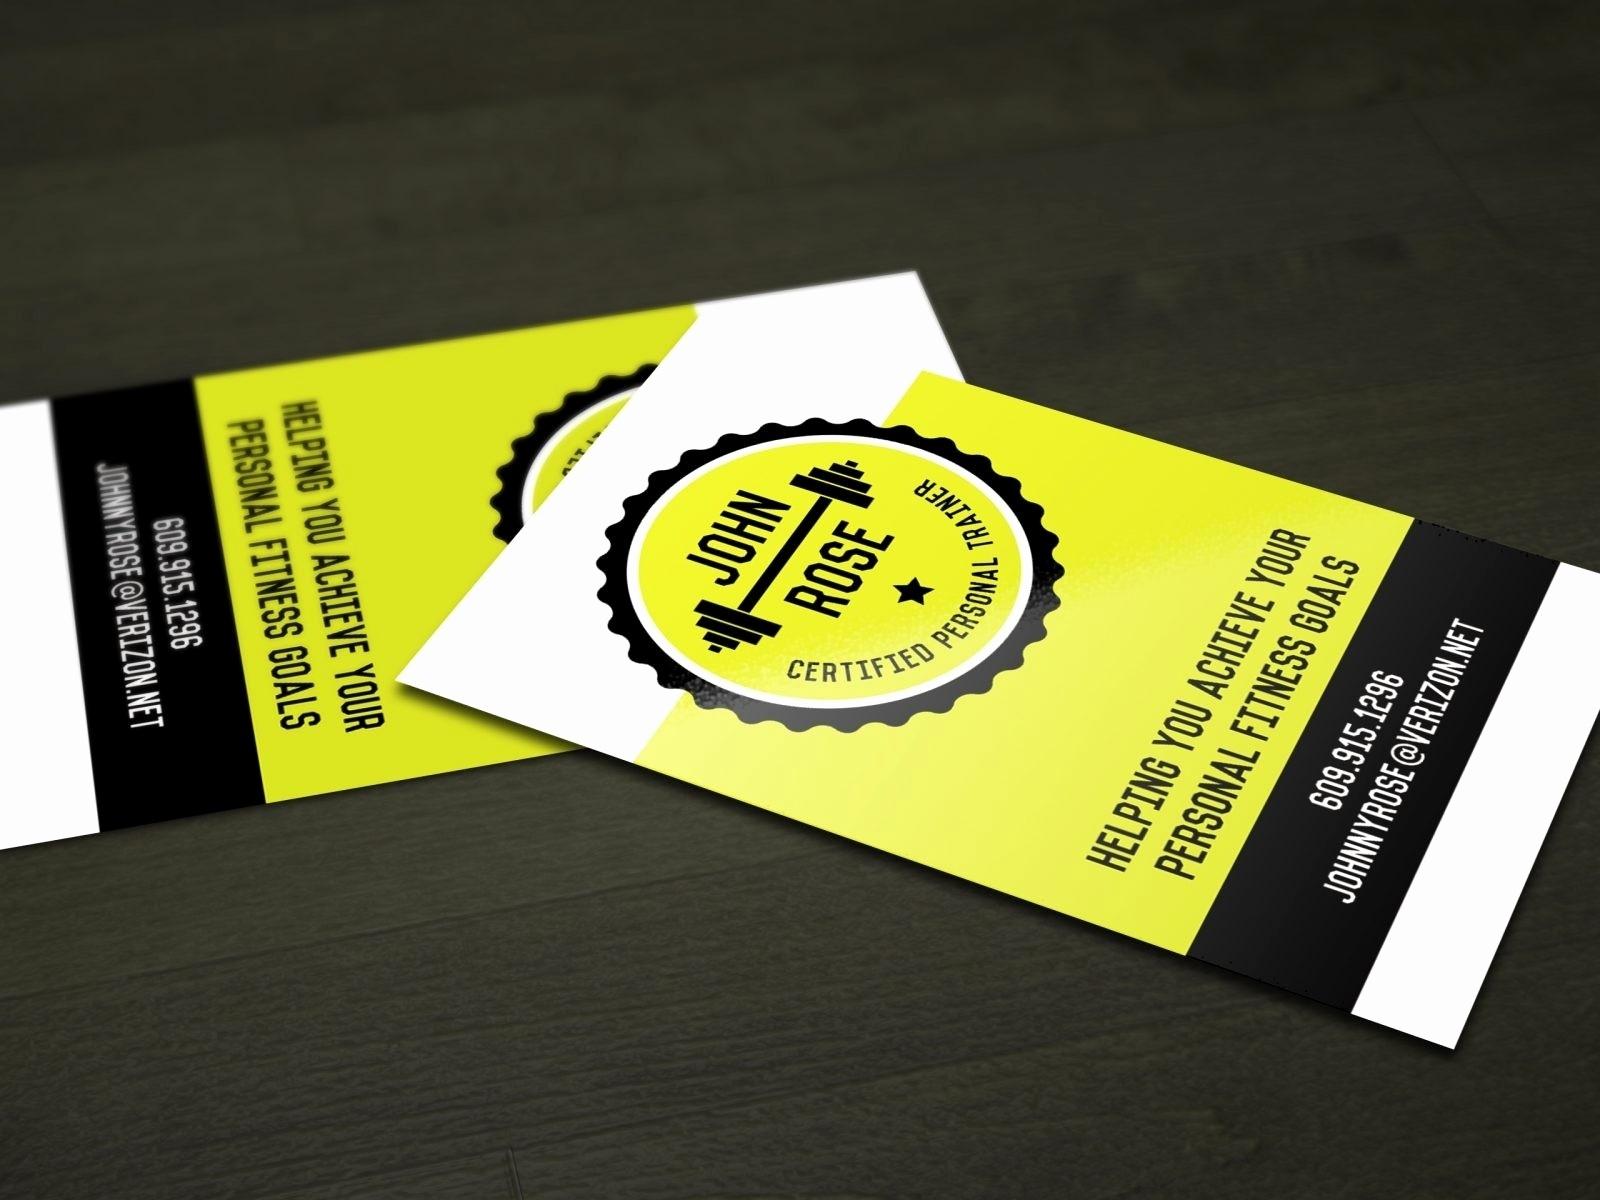 50 Inspirational Free Online Business Card Maker Printable - Online Business Card Maker Free Printable